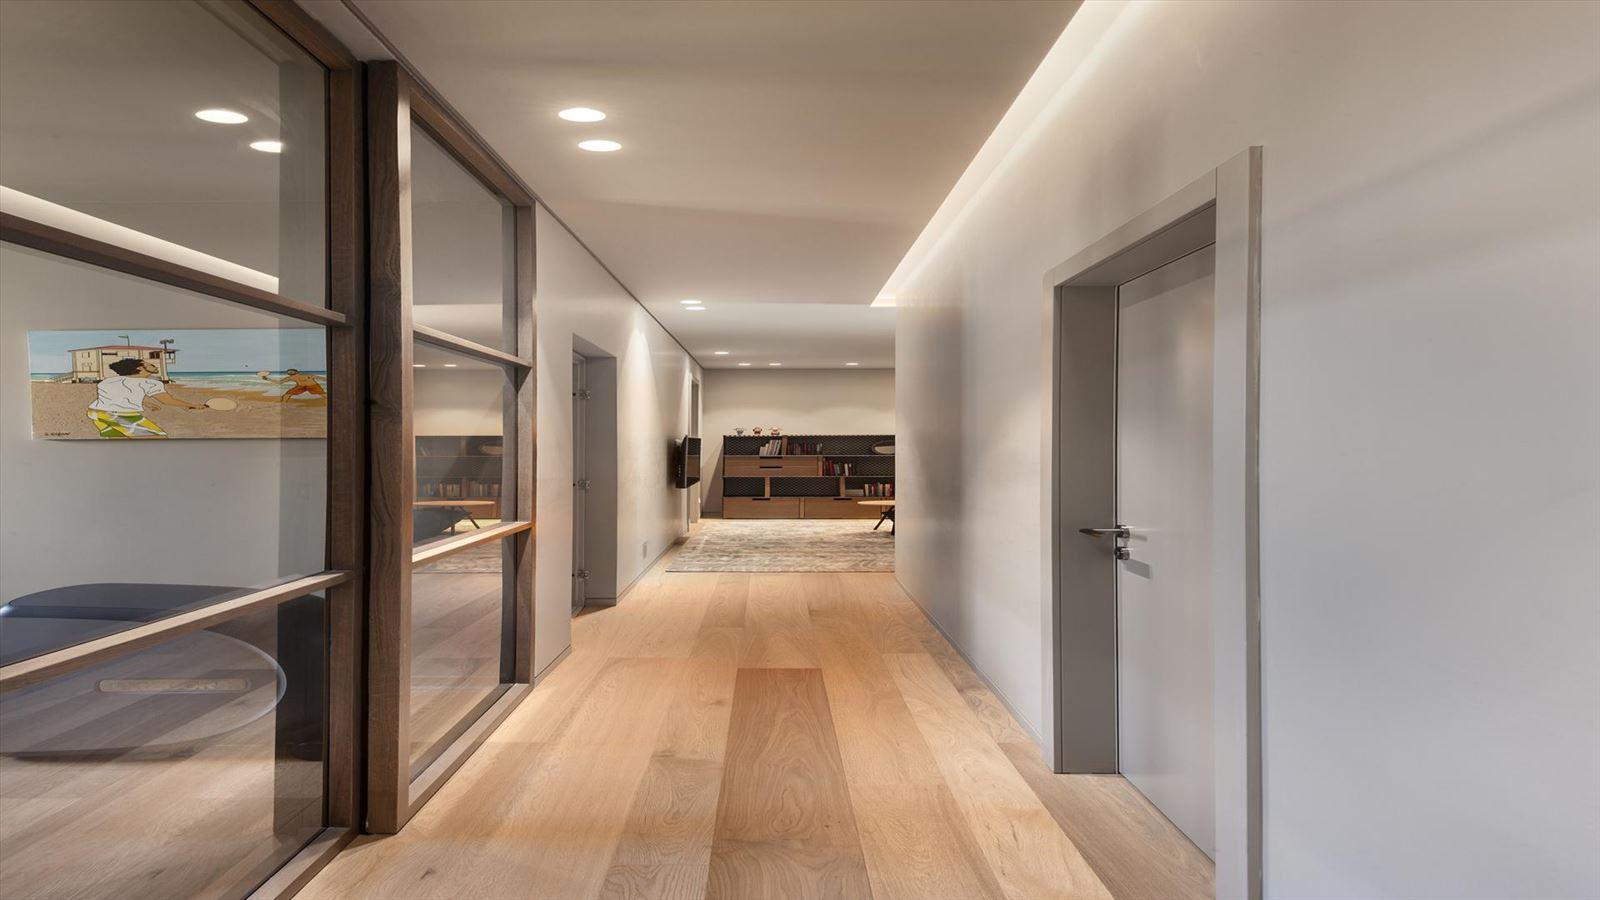 CENTRAL TLV LOFT גופי תאורה מרשימים במסדרונות הבית בעיצוב קמחי תאורה